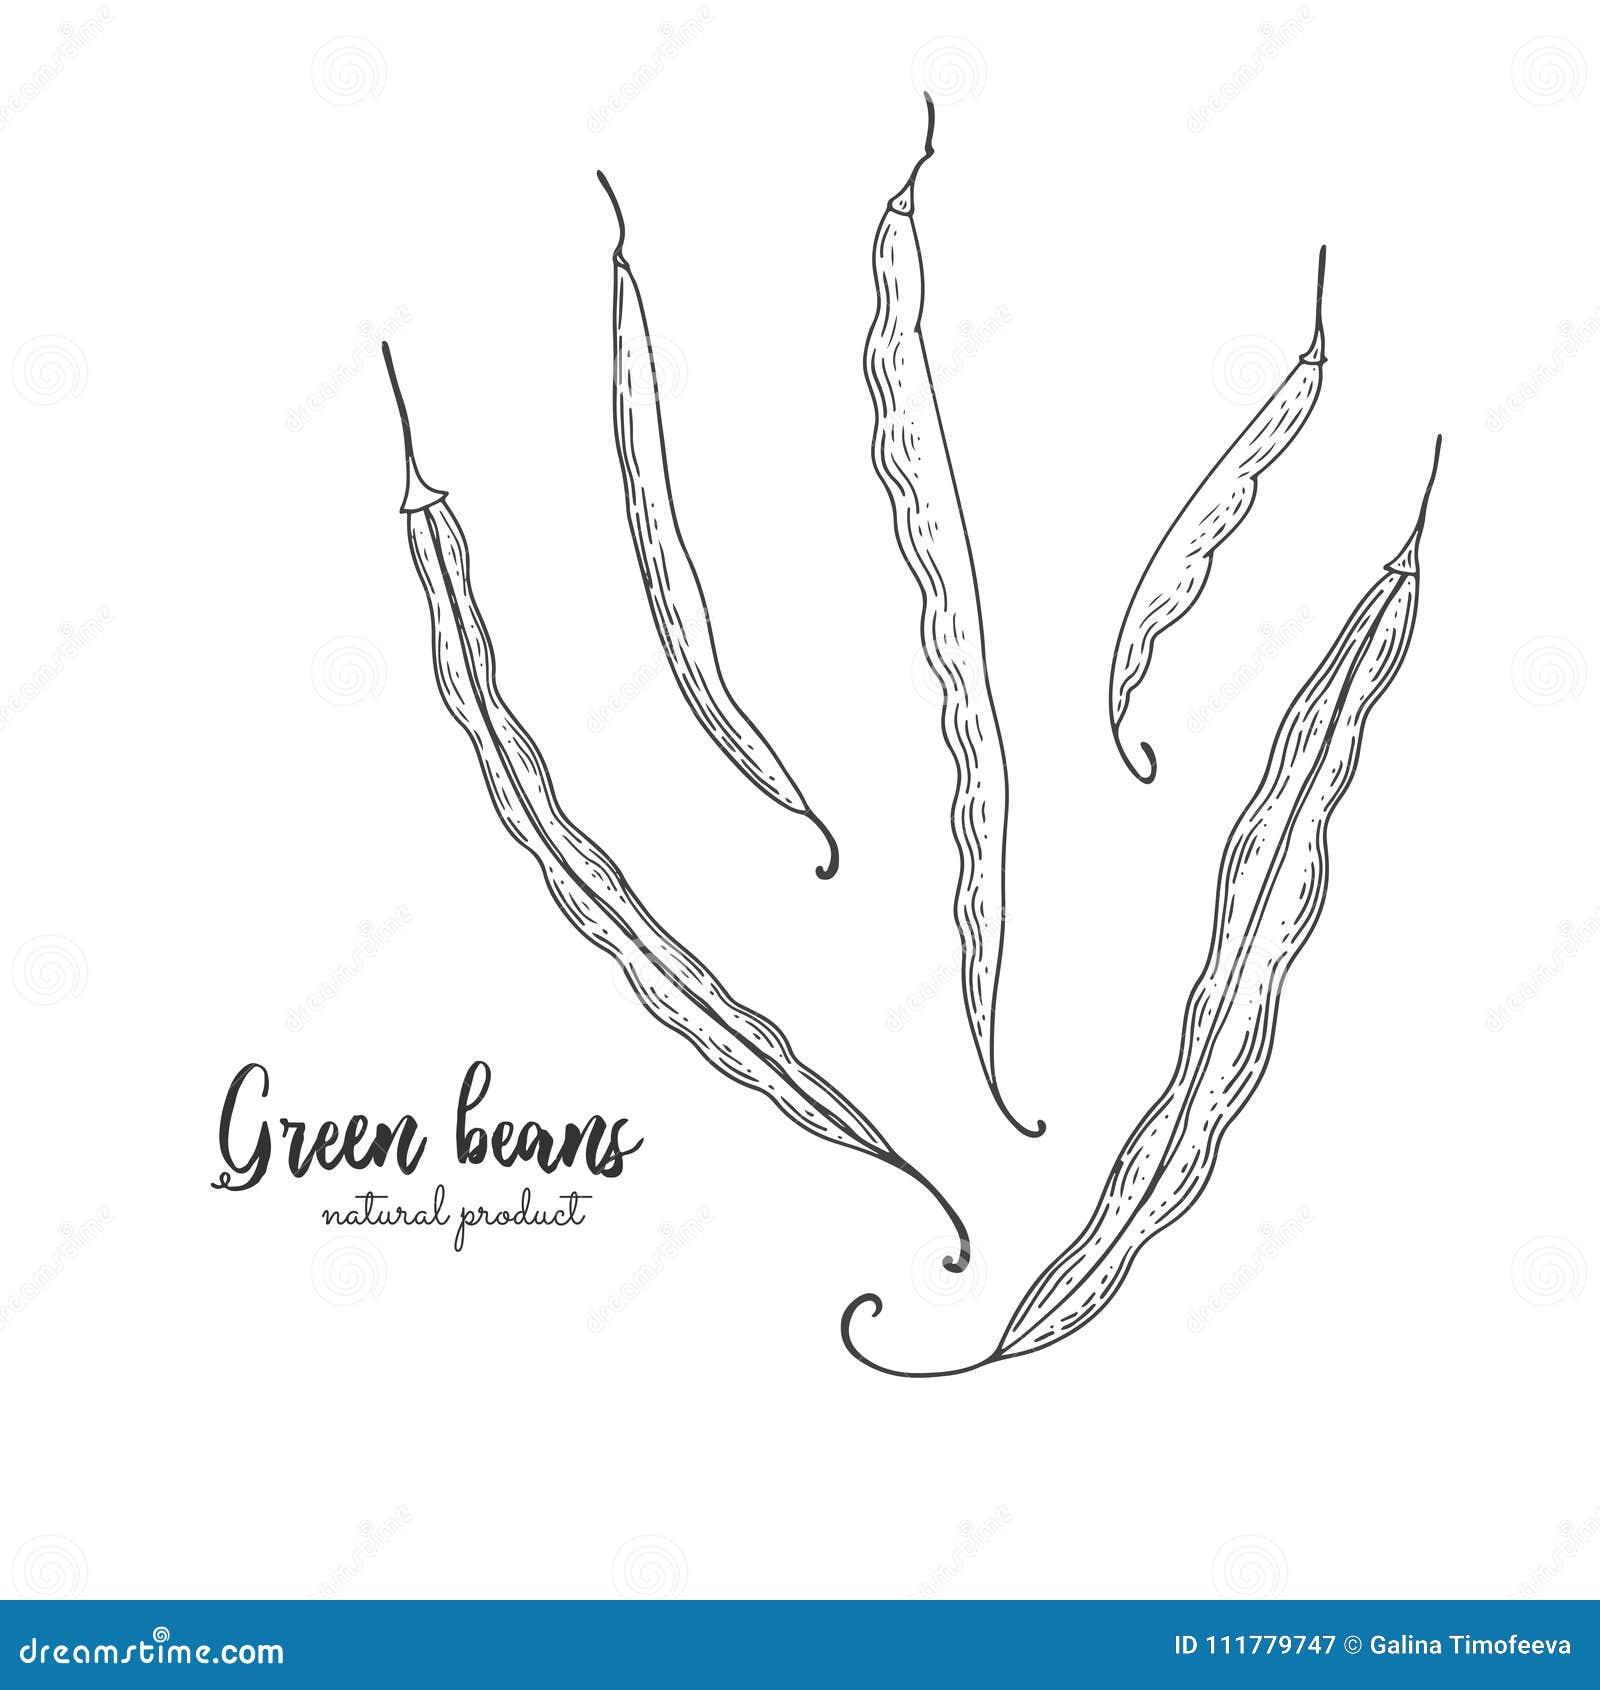 Vegetarian food. Hand drawn isolated green beans. Vector vintage vegetables illustration. Detailed vegetarian food